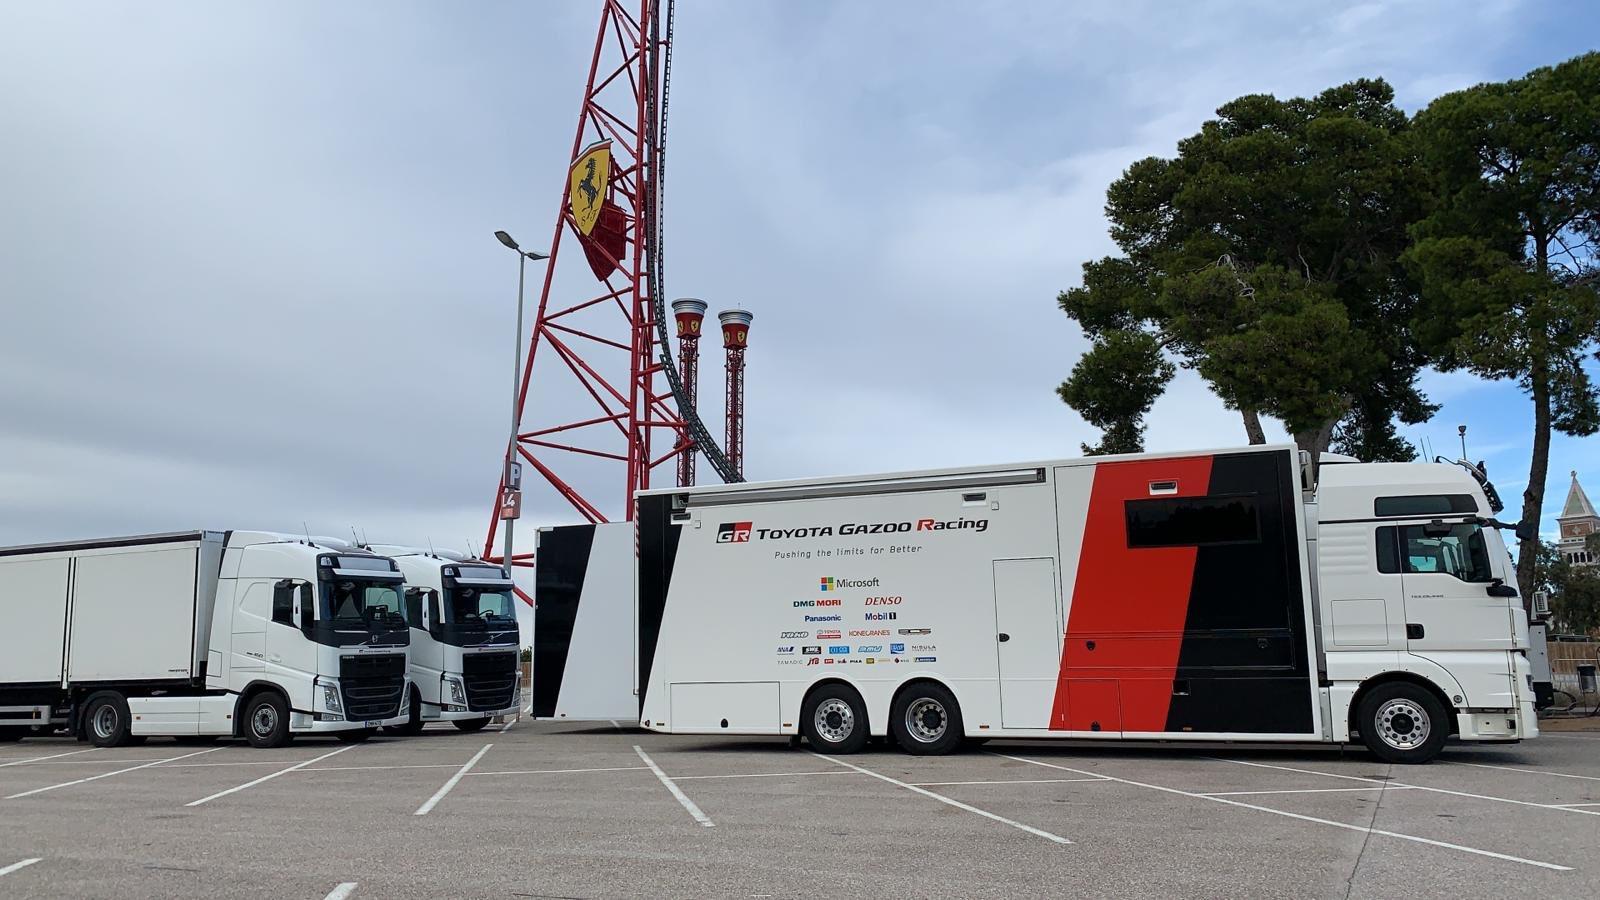 WRC: 55º RallyRACC Catalunya - Costa Daurada - Rally de España [24-27 Octubre] - Página 2 EHFpja8X4AEarrx?format=jpg&name=large